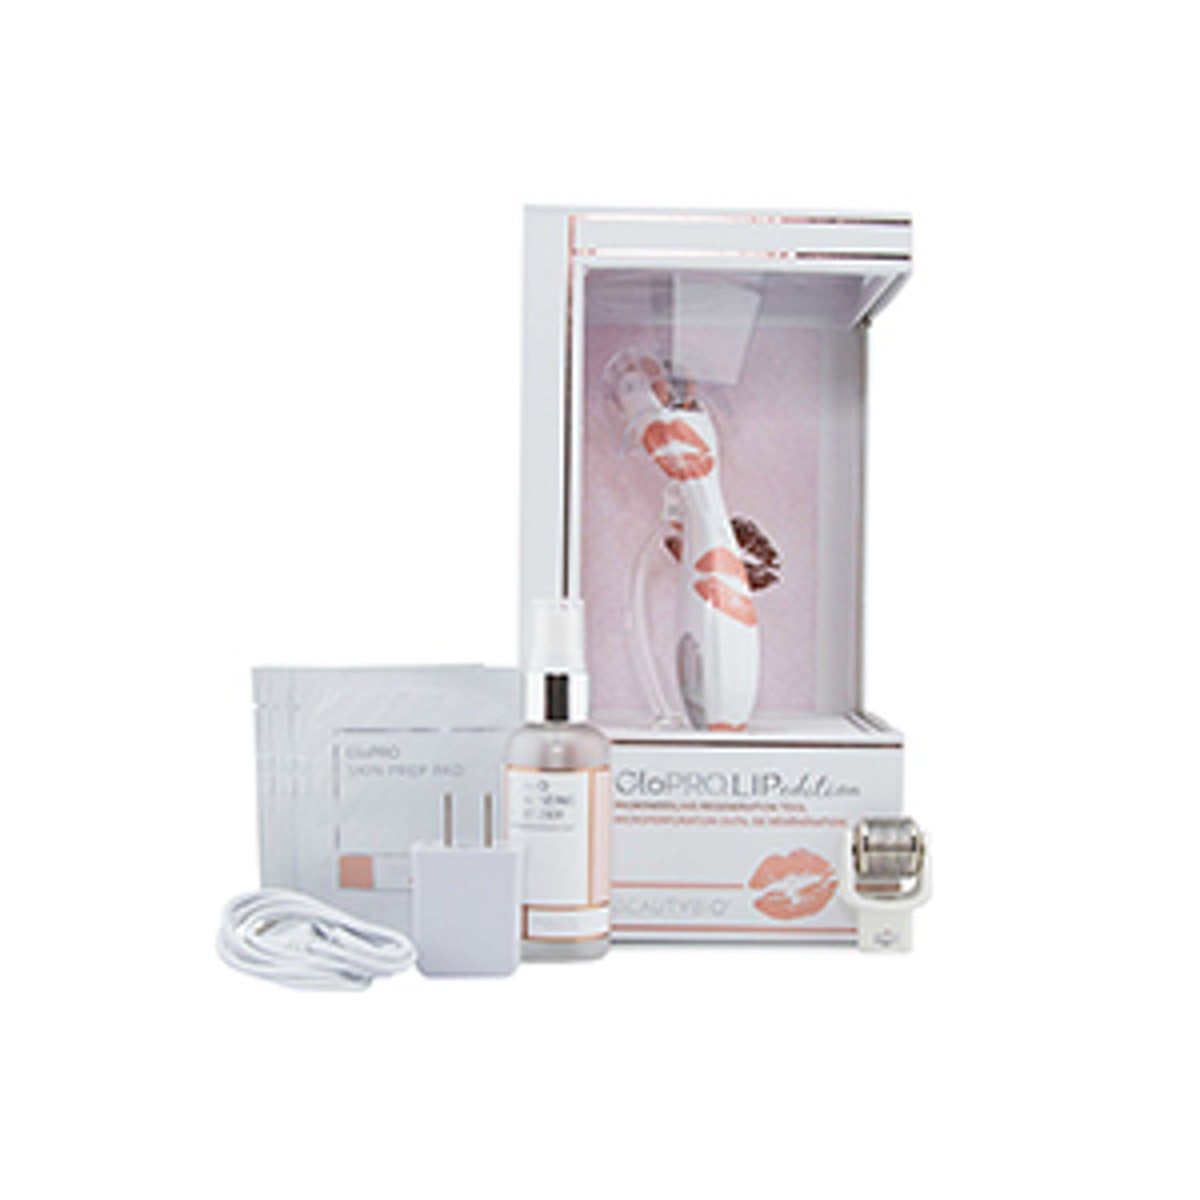 GloPRO Lip Edition Microneedling Regeneration Tool & MicroTip™ Attachment